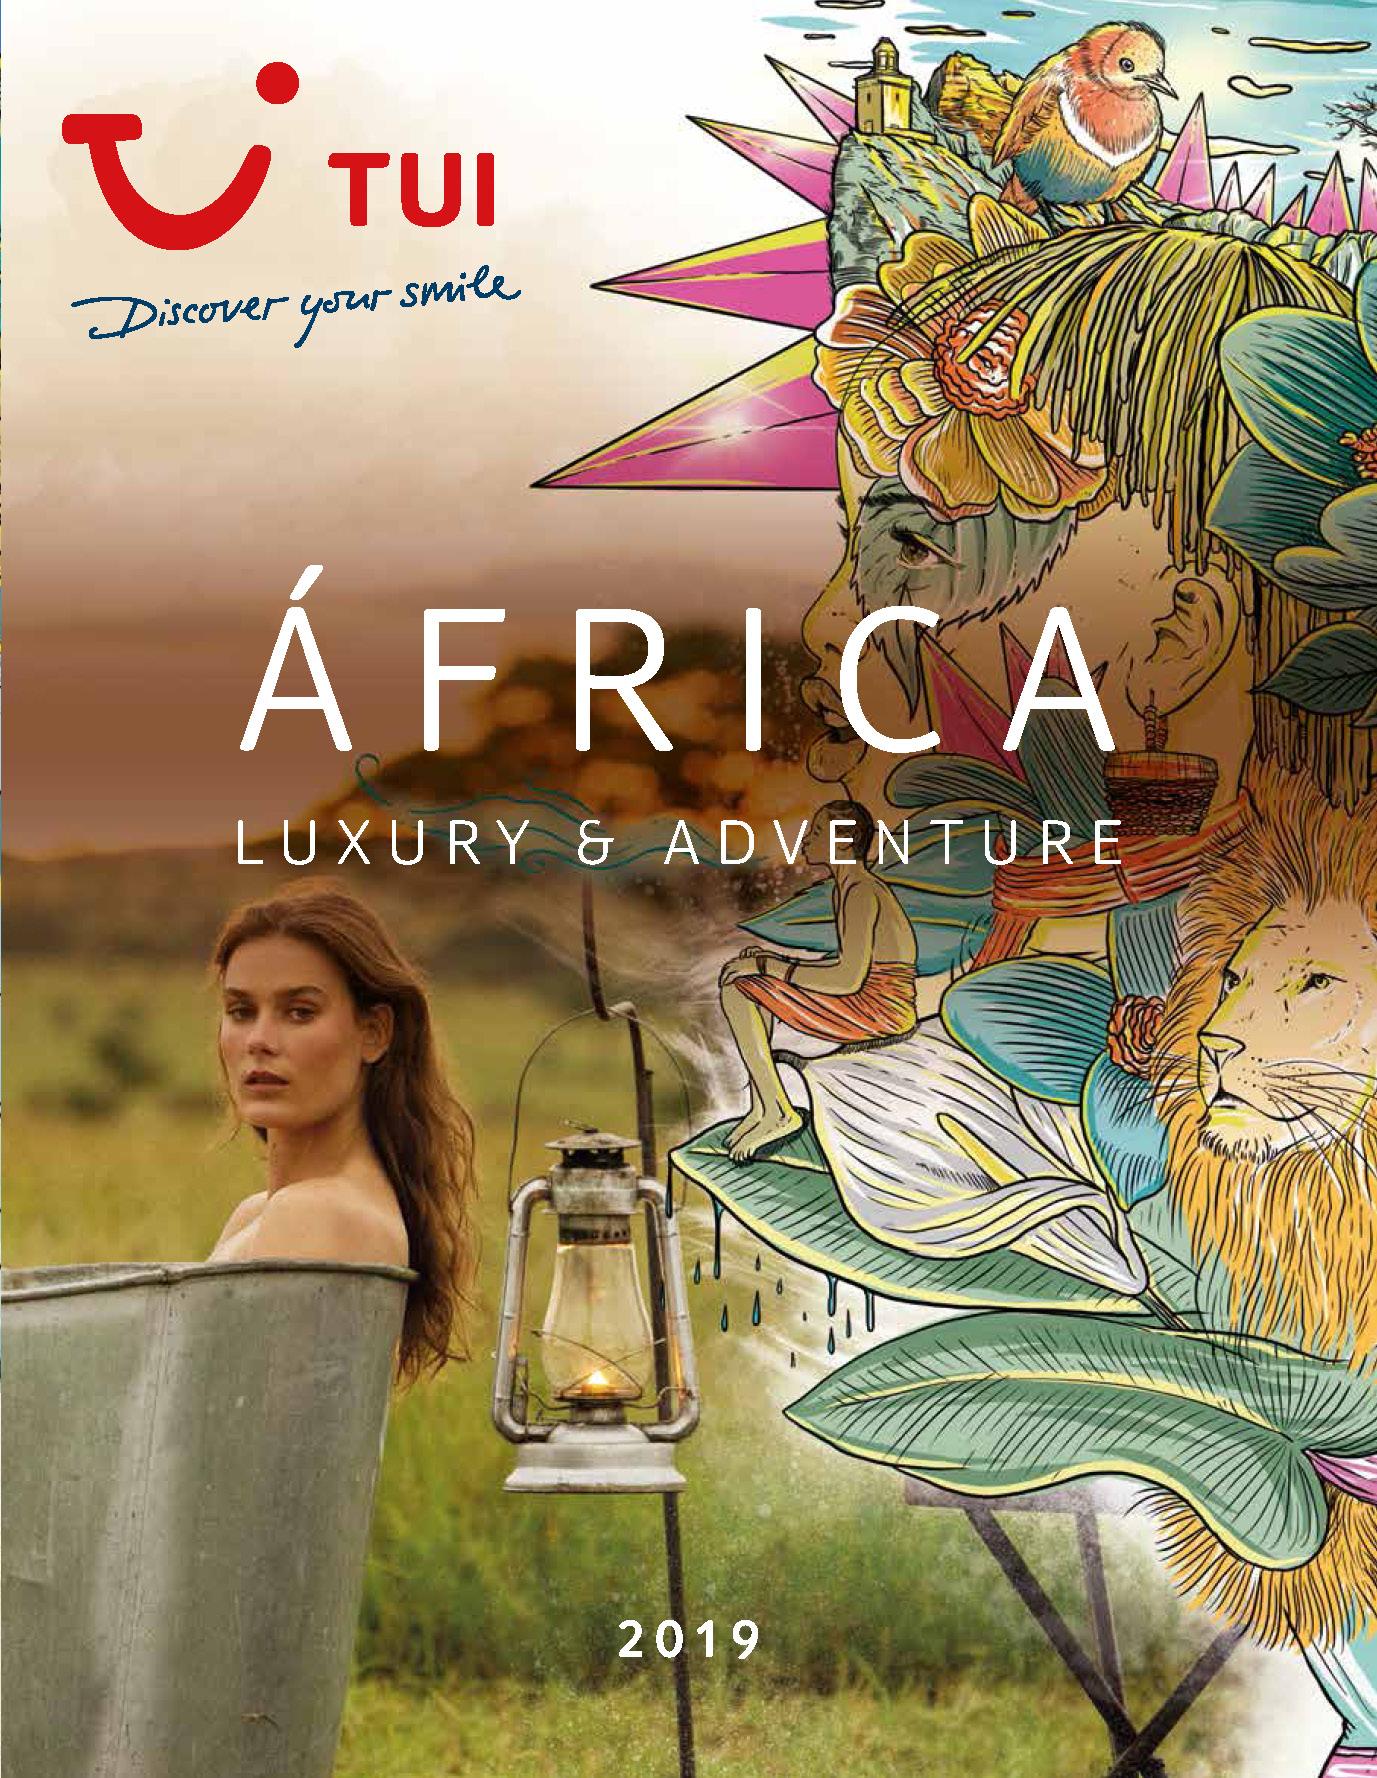 Catalogo TUI Ambassador Tours Africa Lujo y Aventura 2019